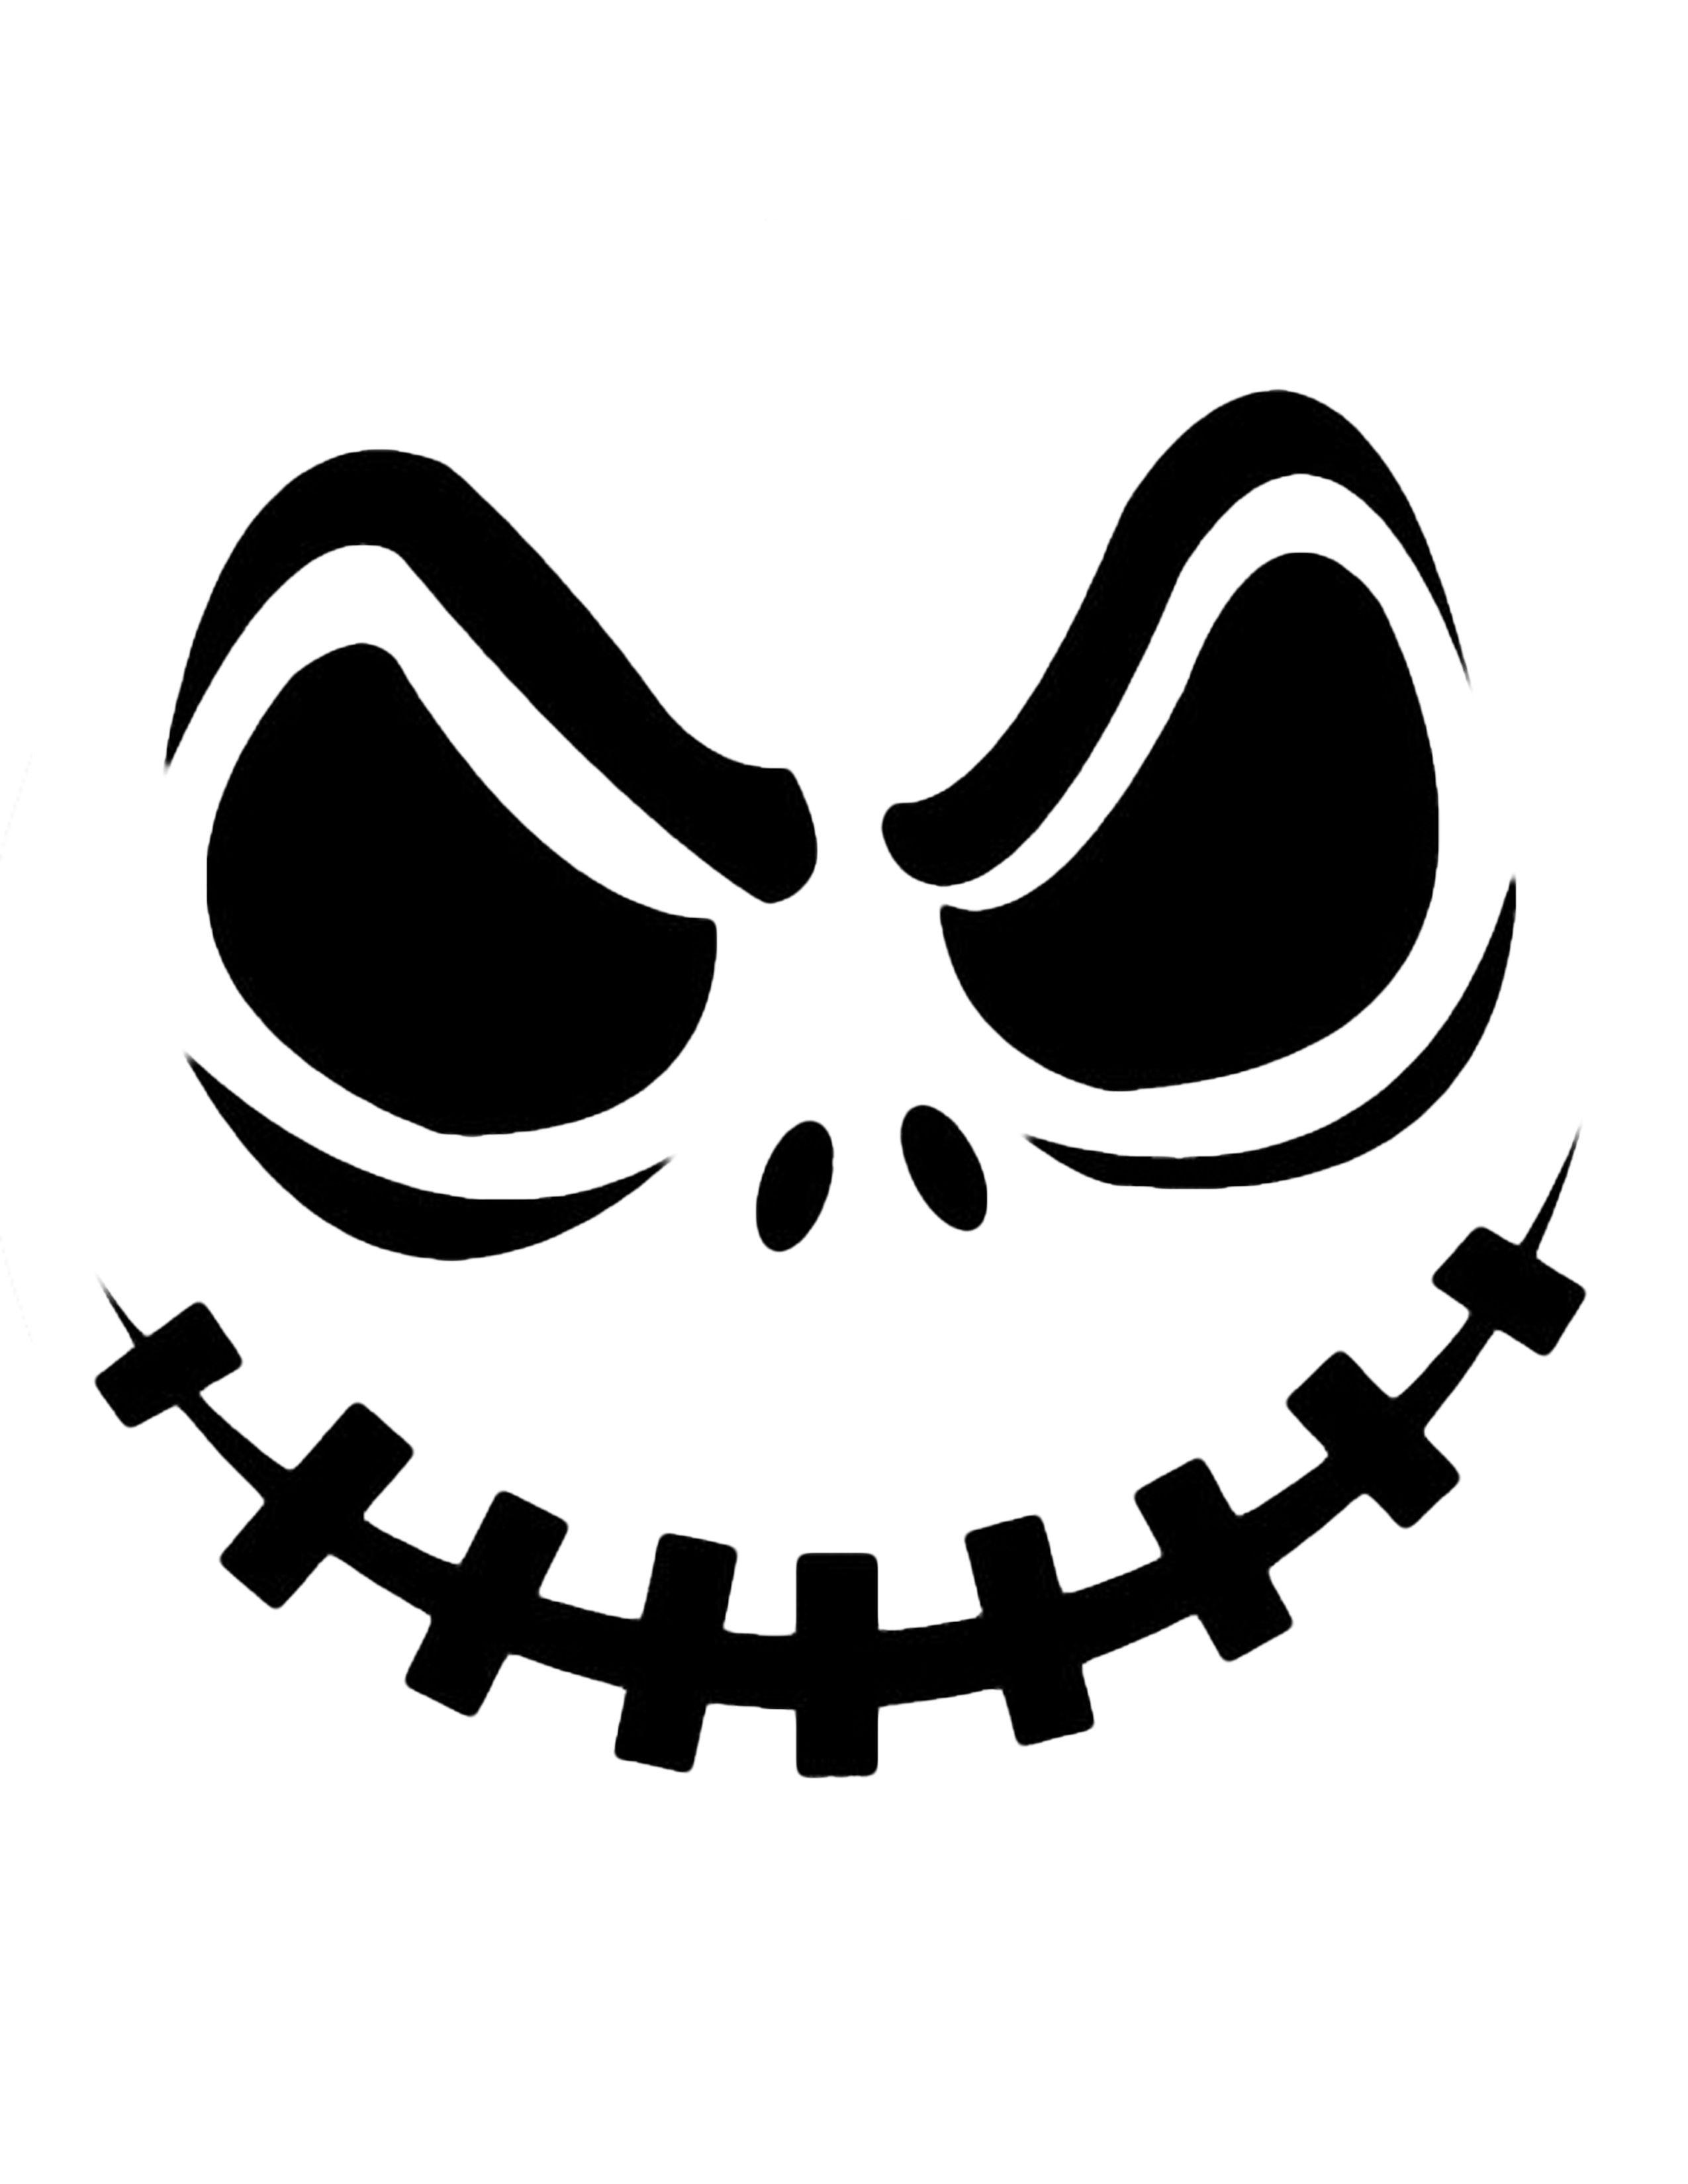 Pin Pumpkin Stencil For Your Jack O Lantern Hunger Games 600X600 - Jack O Lantern Templates Printable Free